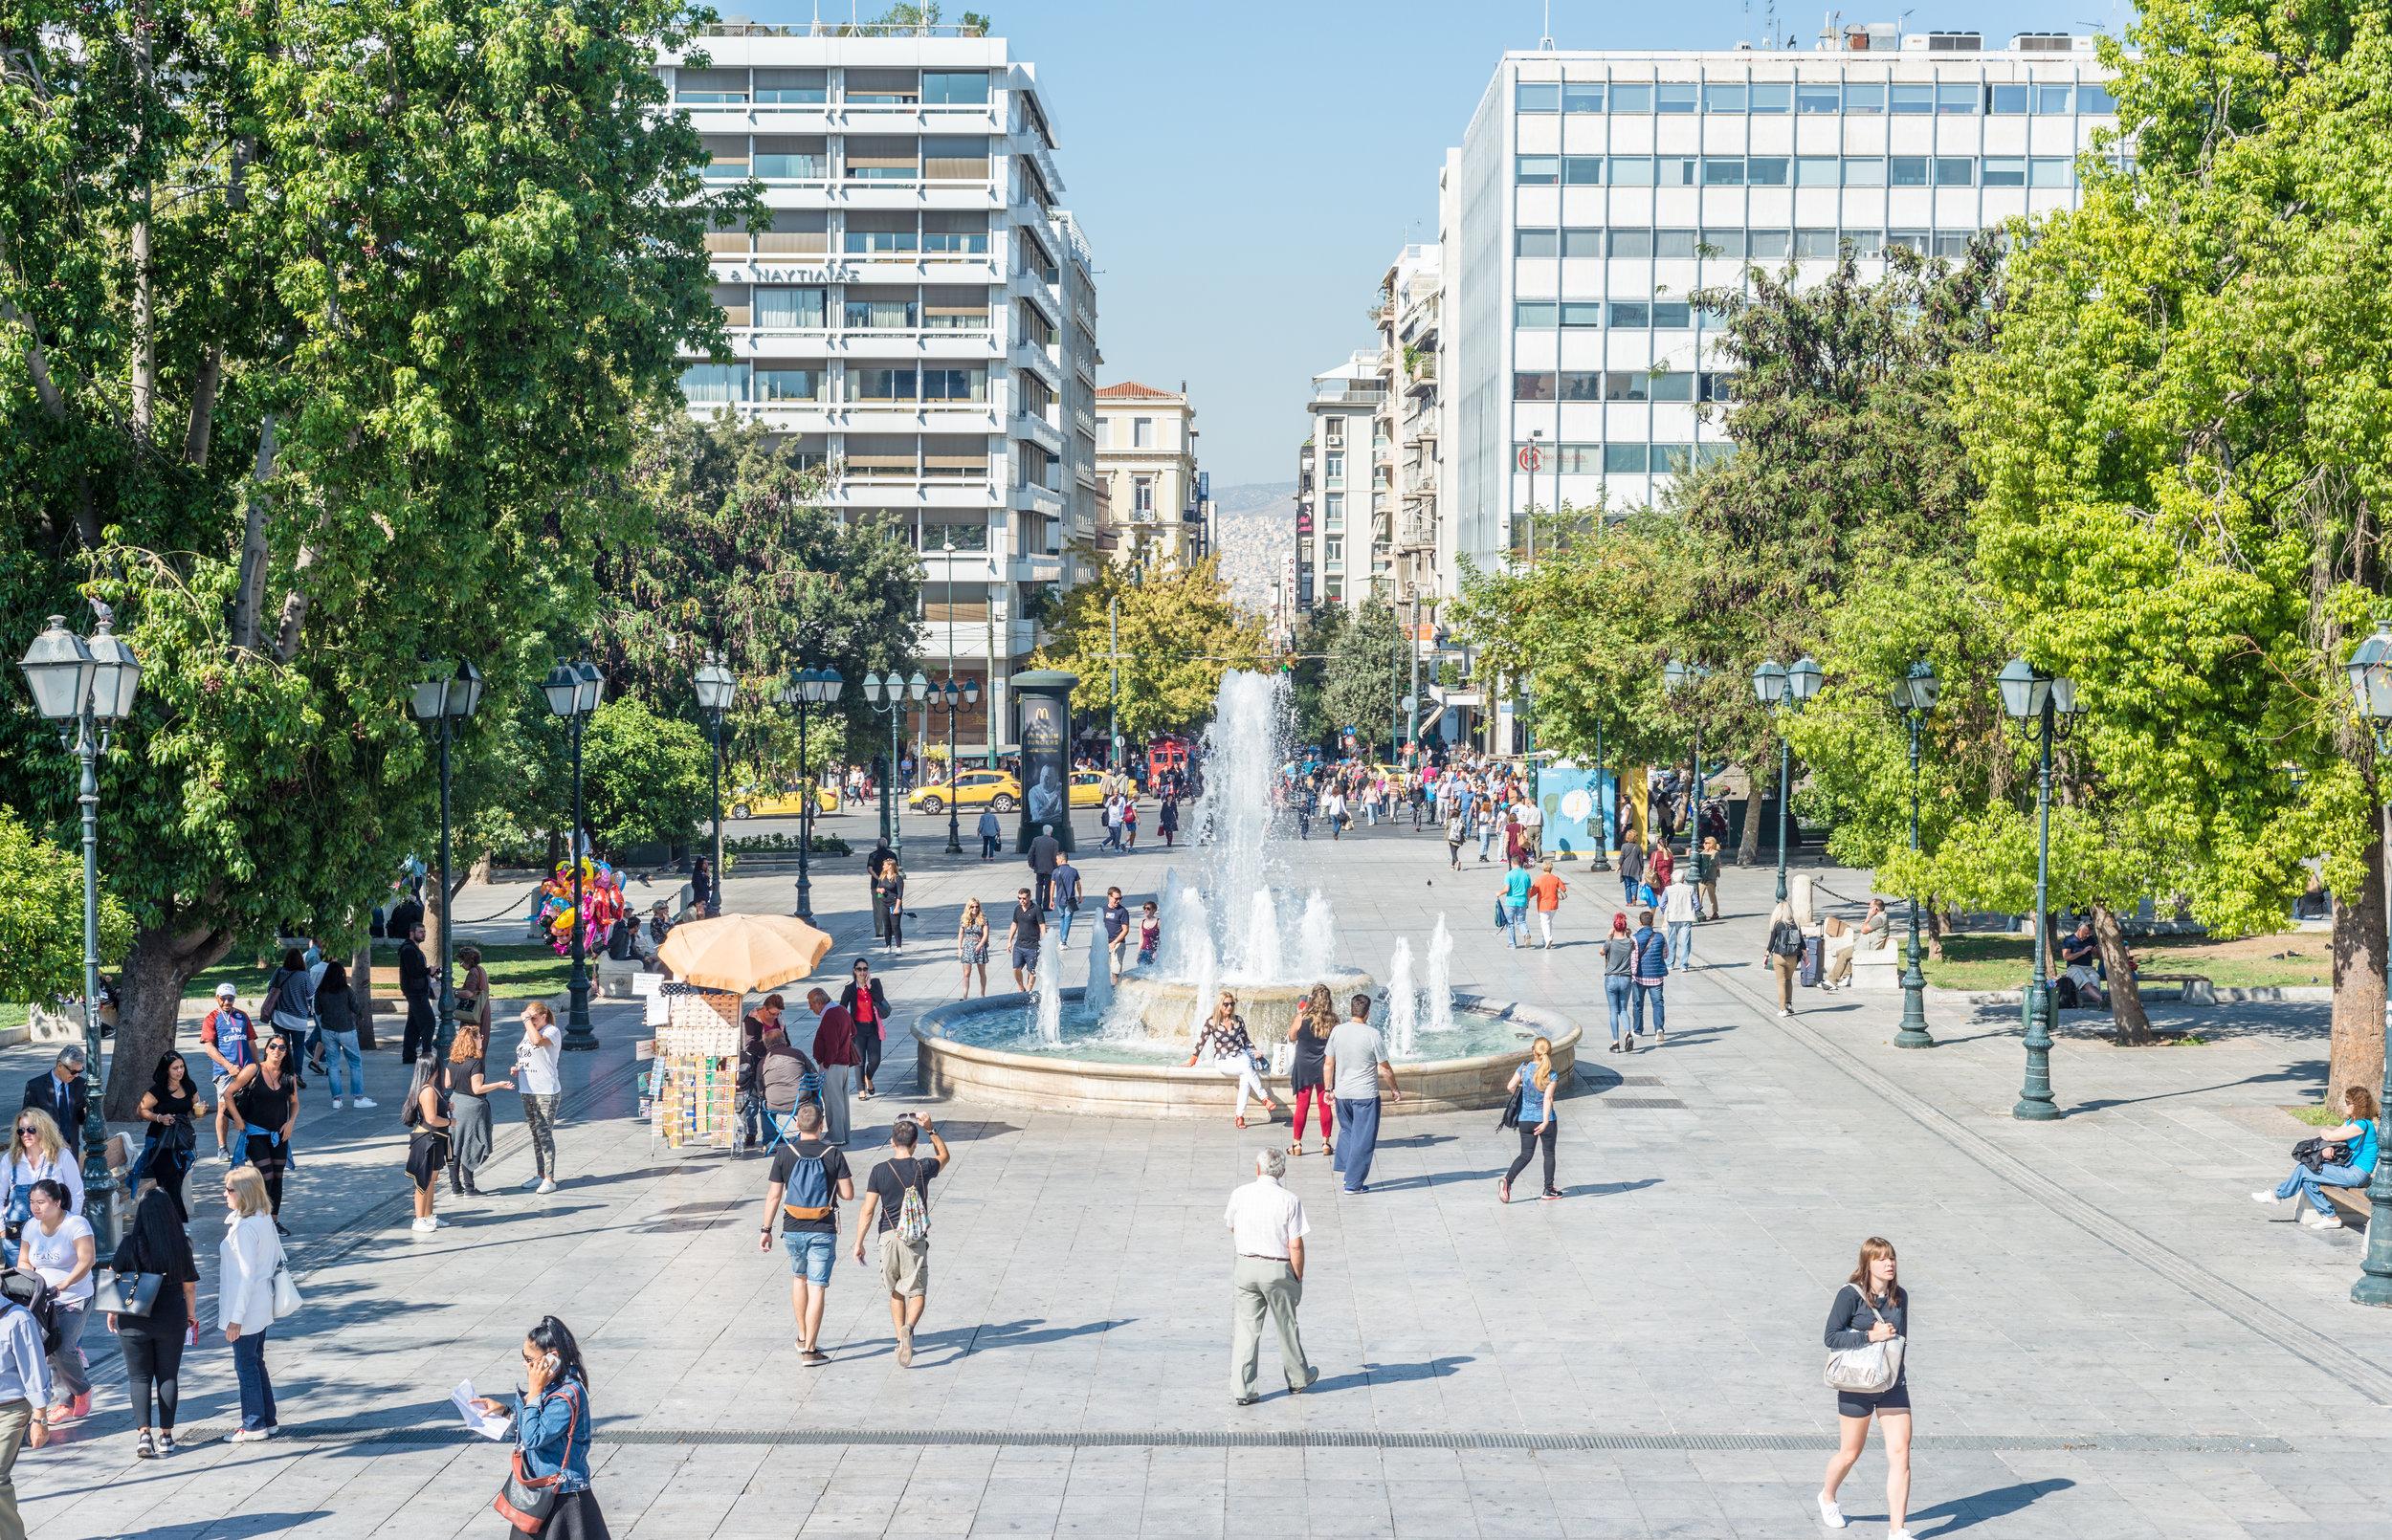 Downtown Athens, Greece